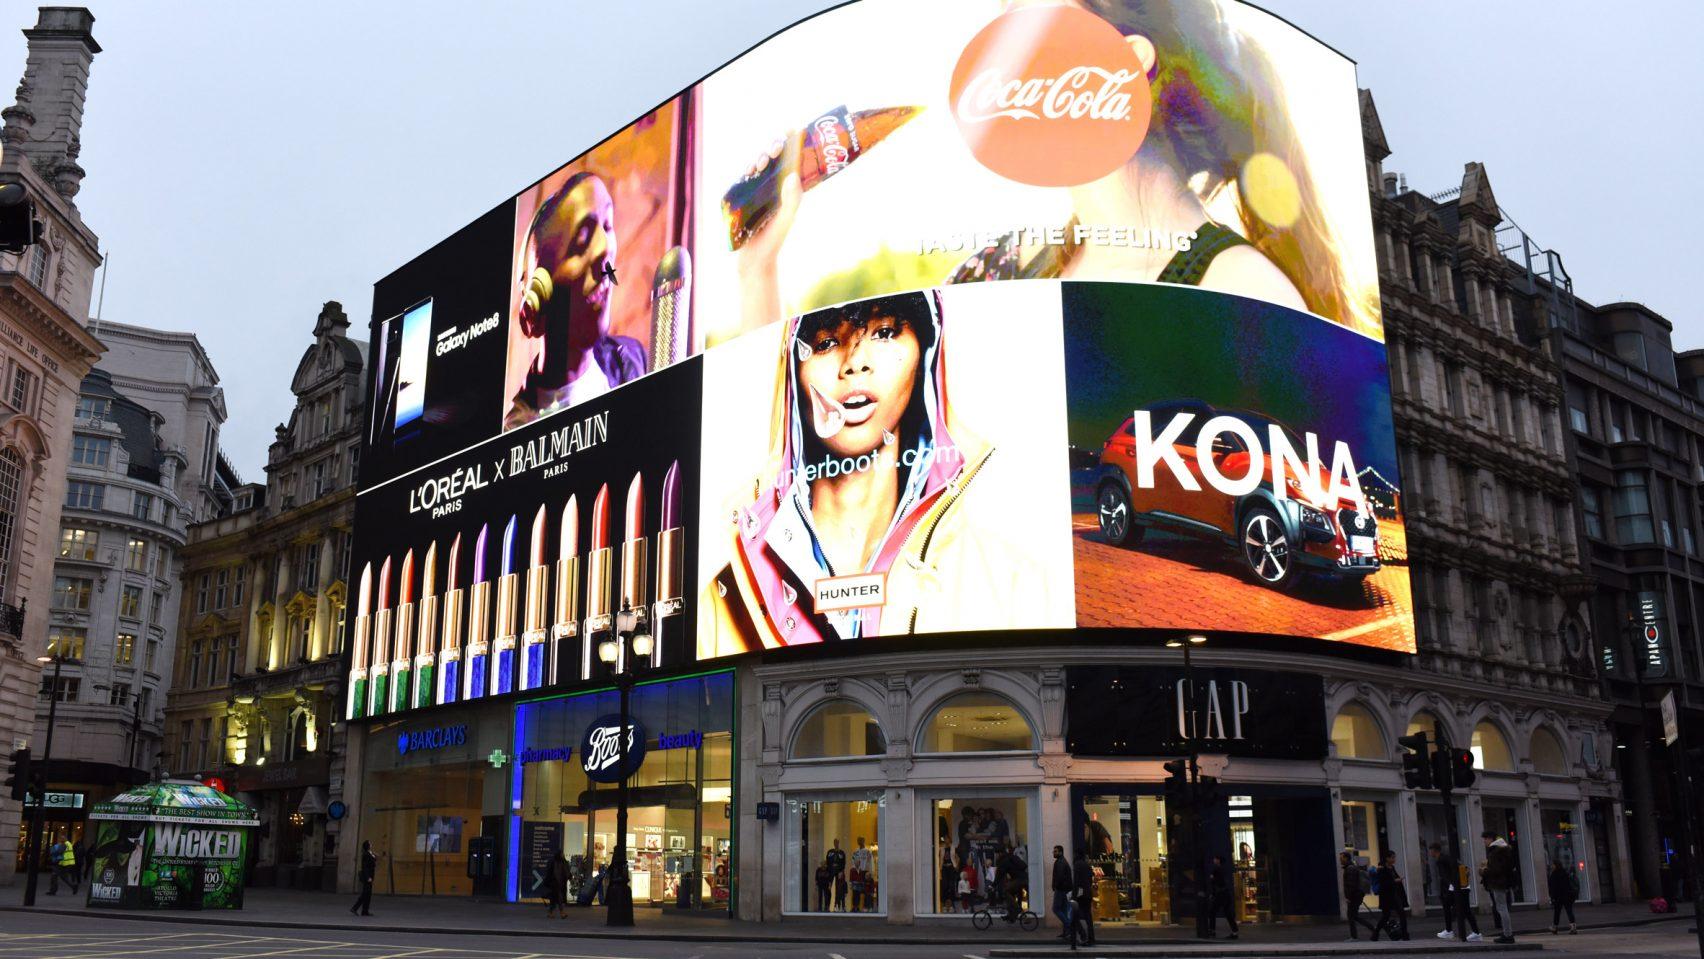 piccadilly-circus-billboard-new-artificial-intelligence-landsec-hero1-1704x959.jpg